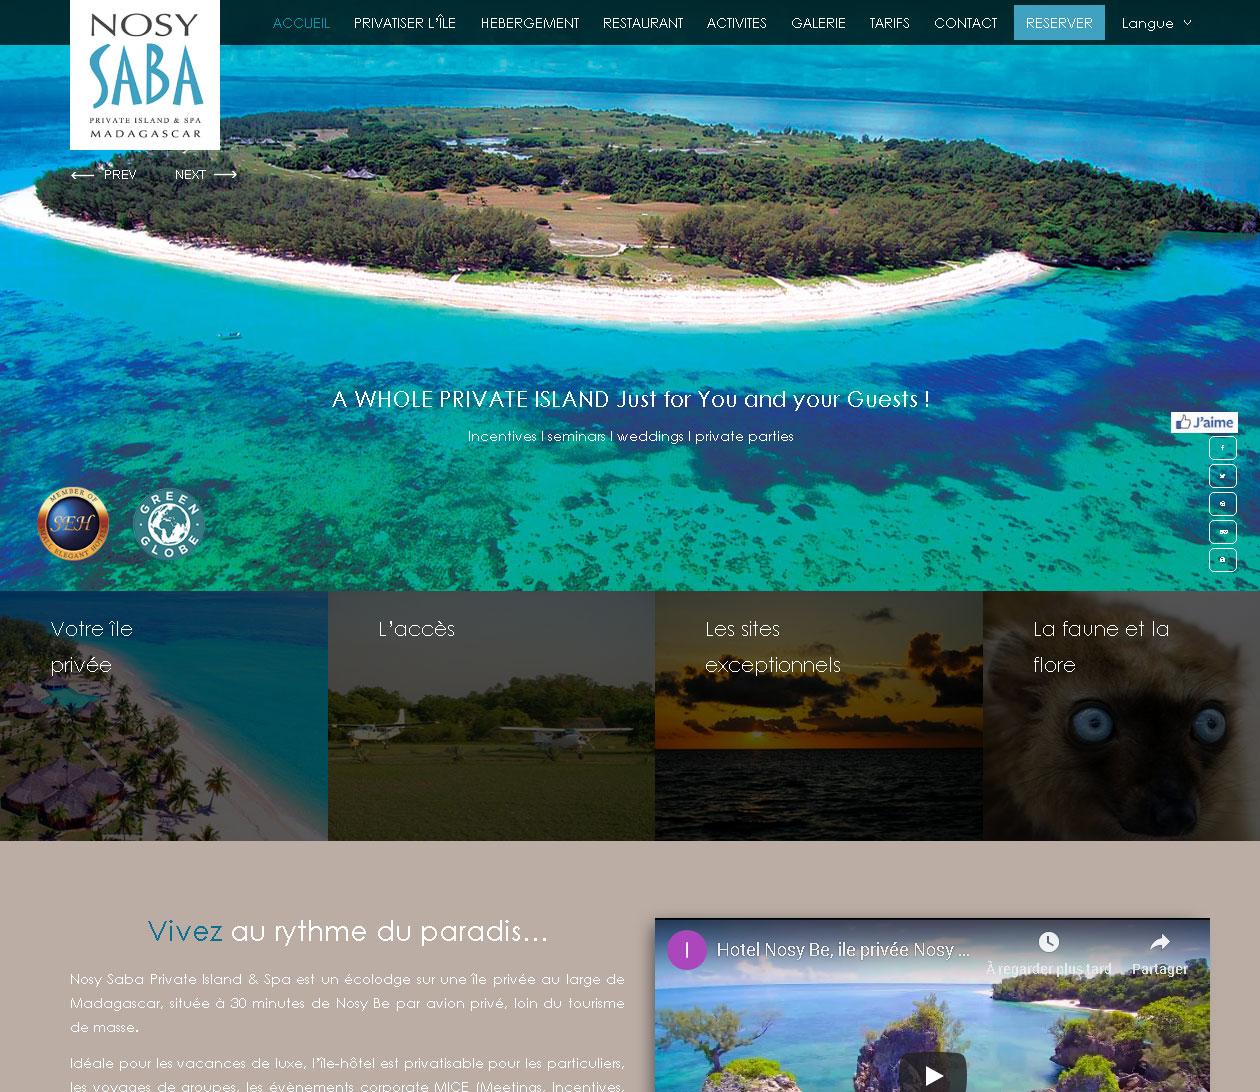 Site prémium - Nosy Saba